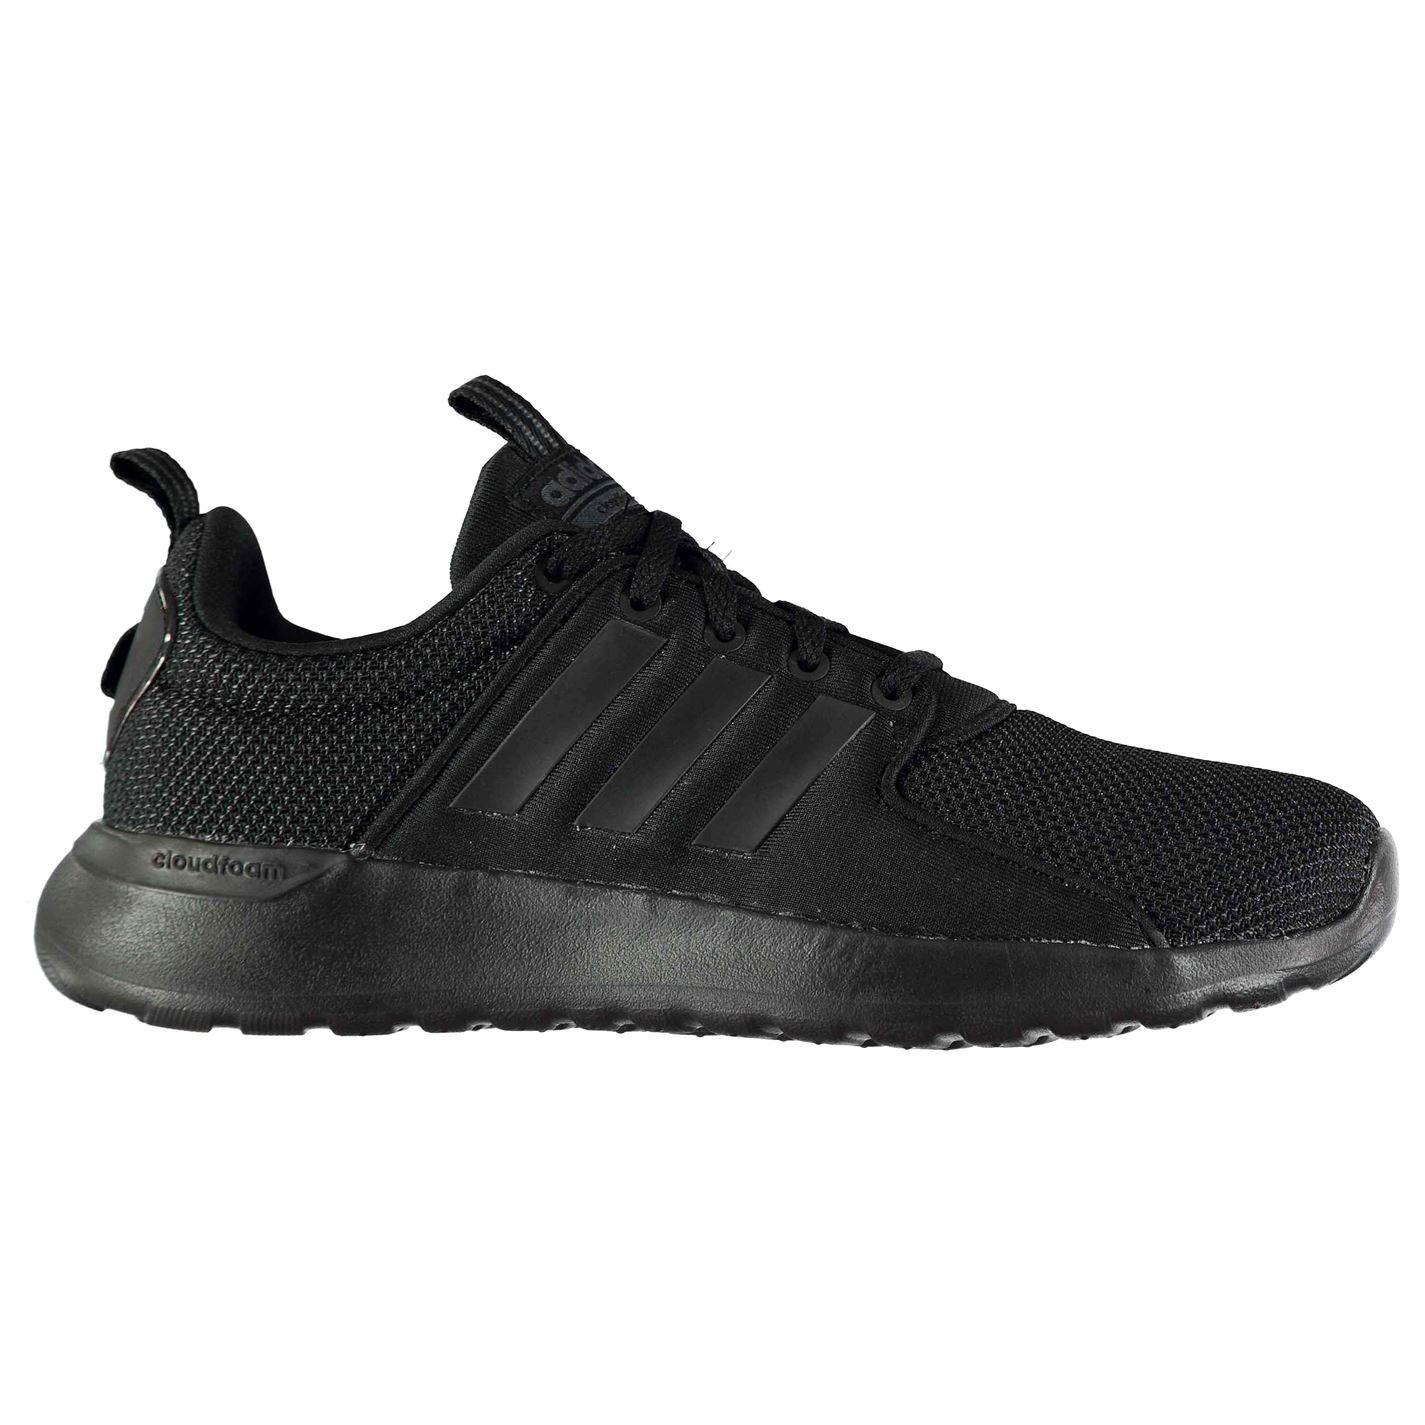 Adidas para Zapatillas hombre Cloudfoam Lite Racer Zapatillas para corredores con Cordones Transpirable Acolchado 82f124